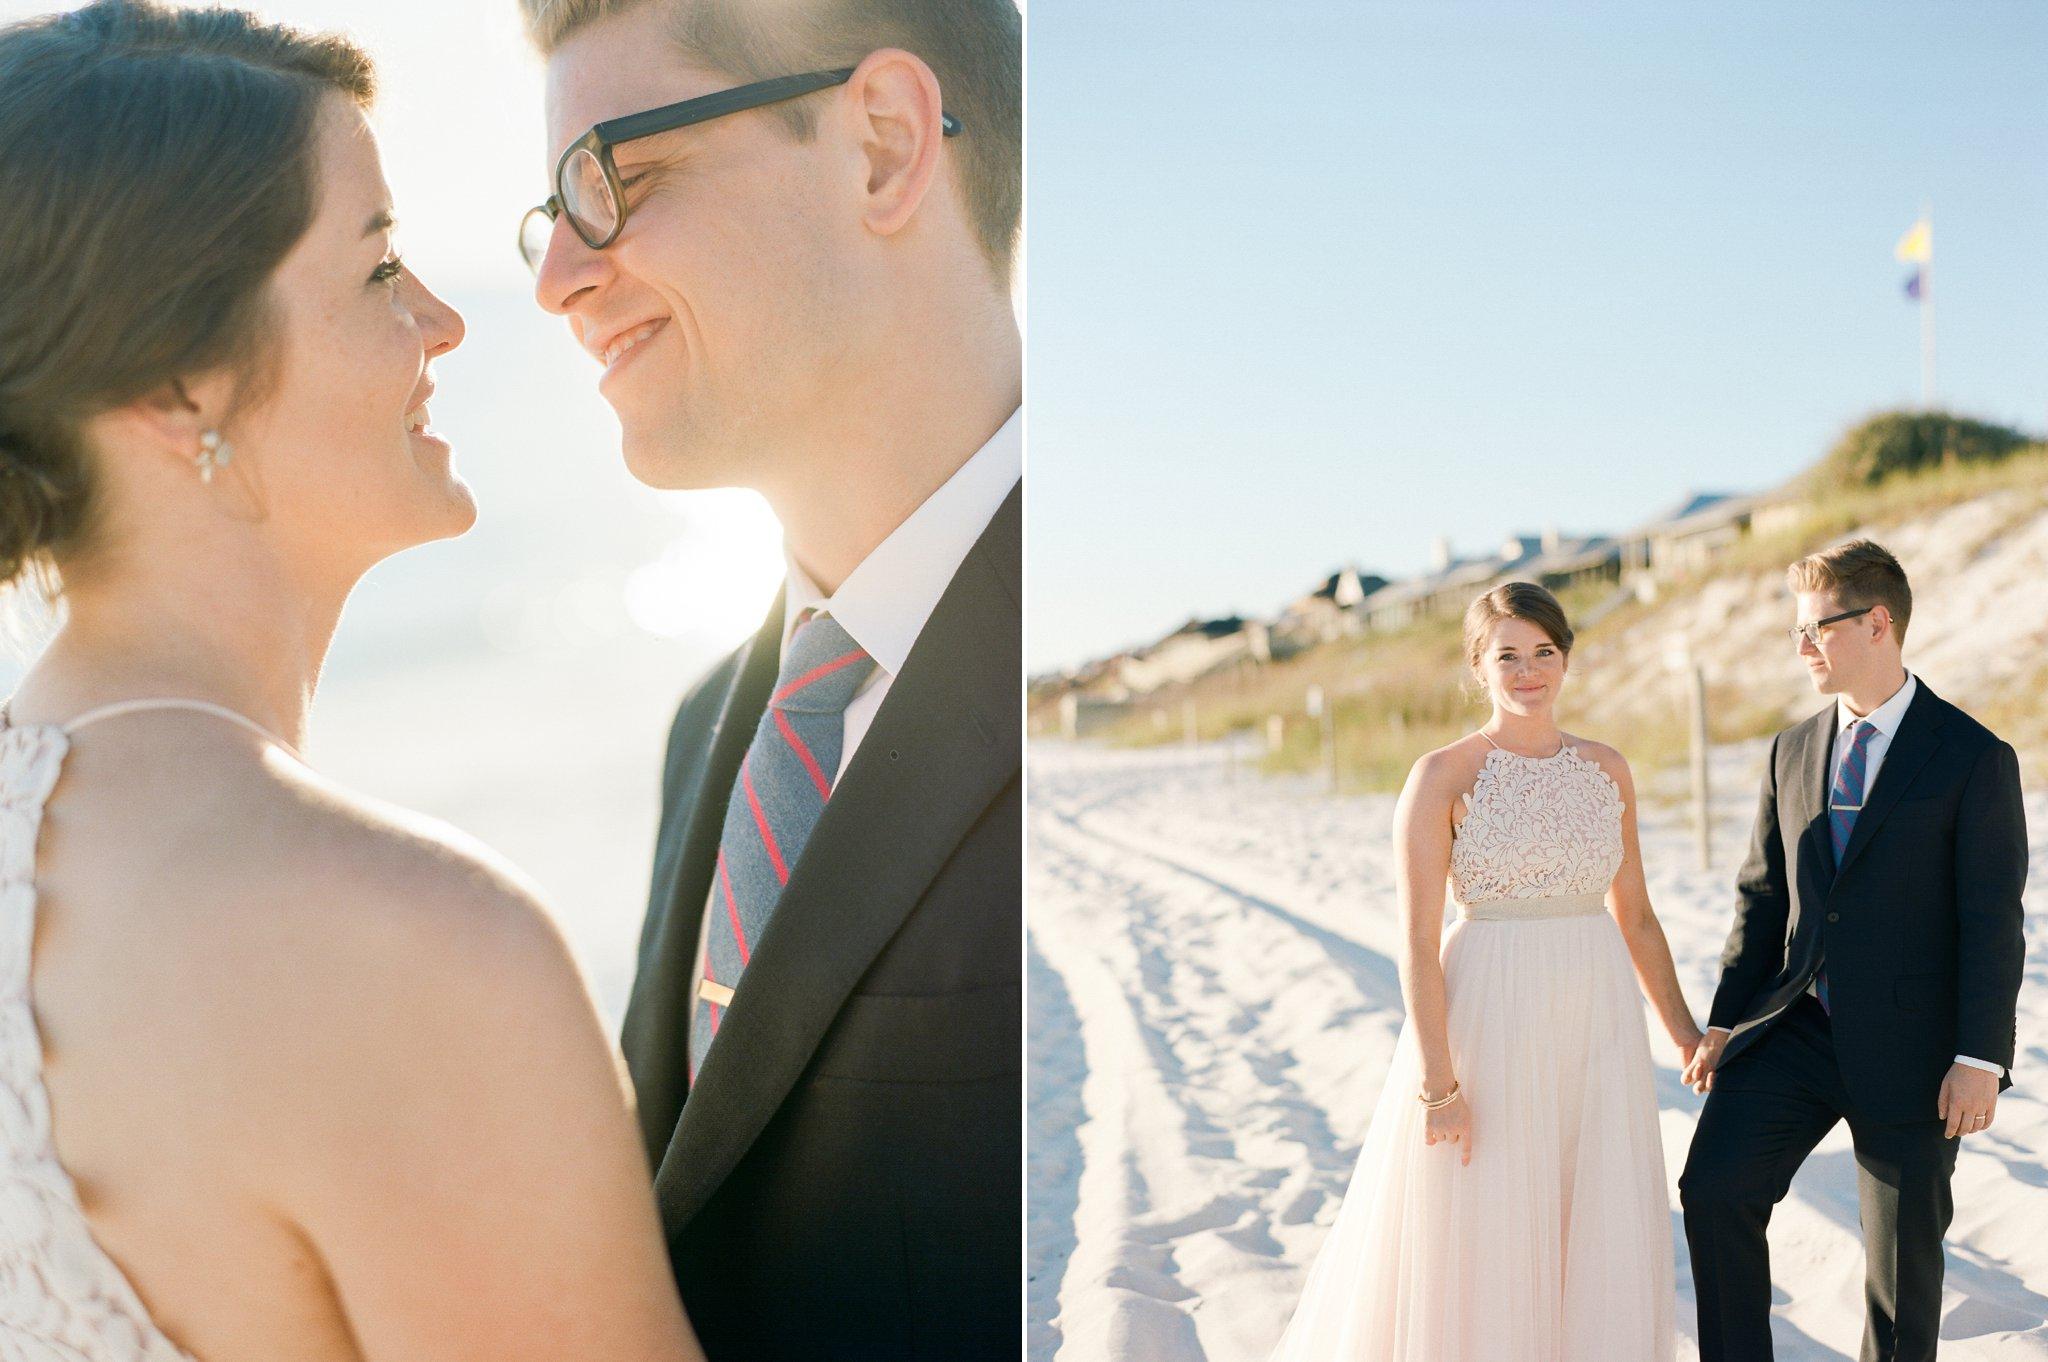 inlet beach wedding 30a wedding inlet beach wedding photographer shannon griffin photography_0028.jpg